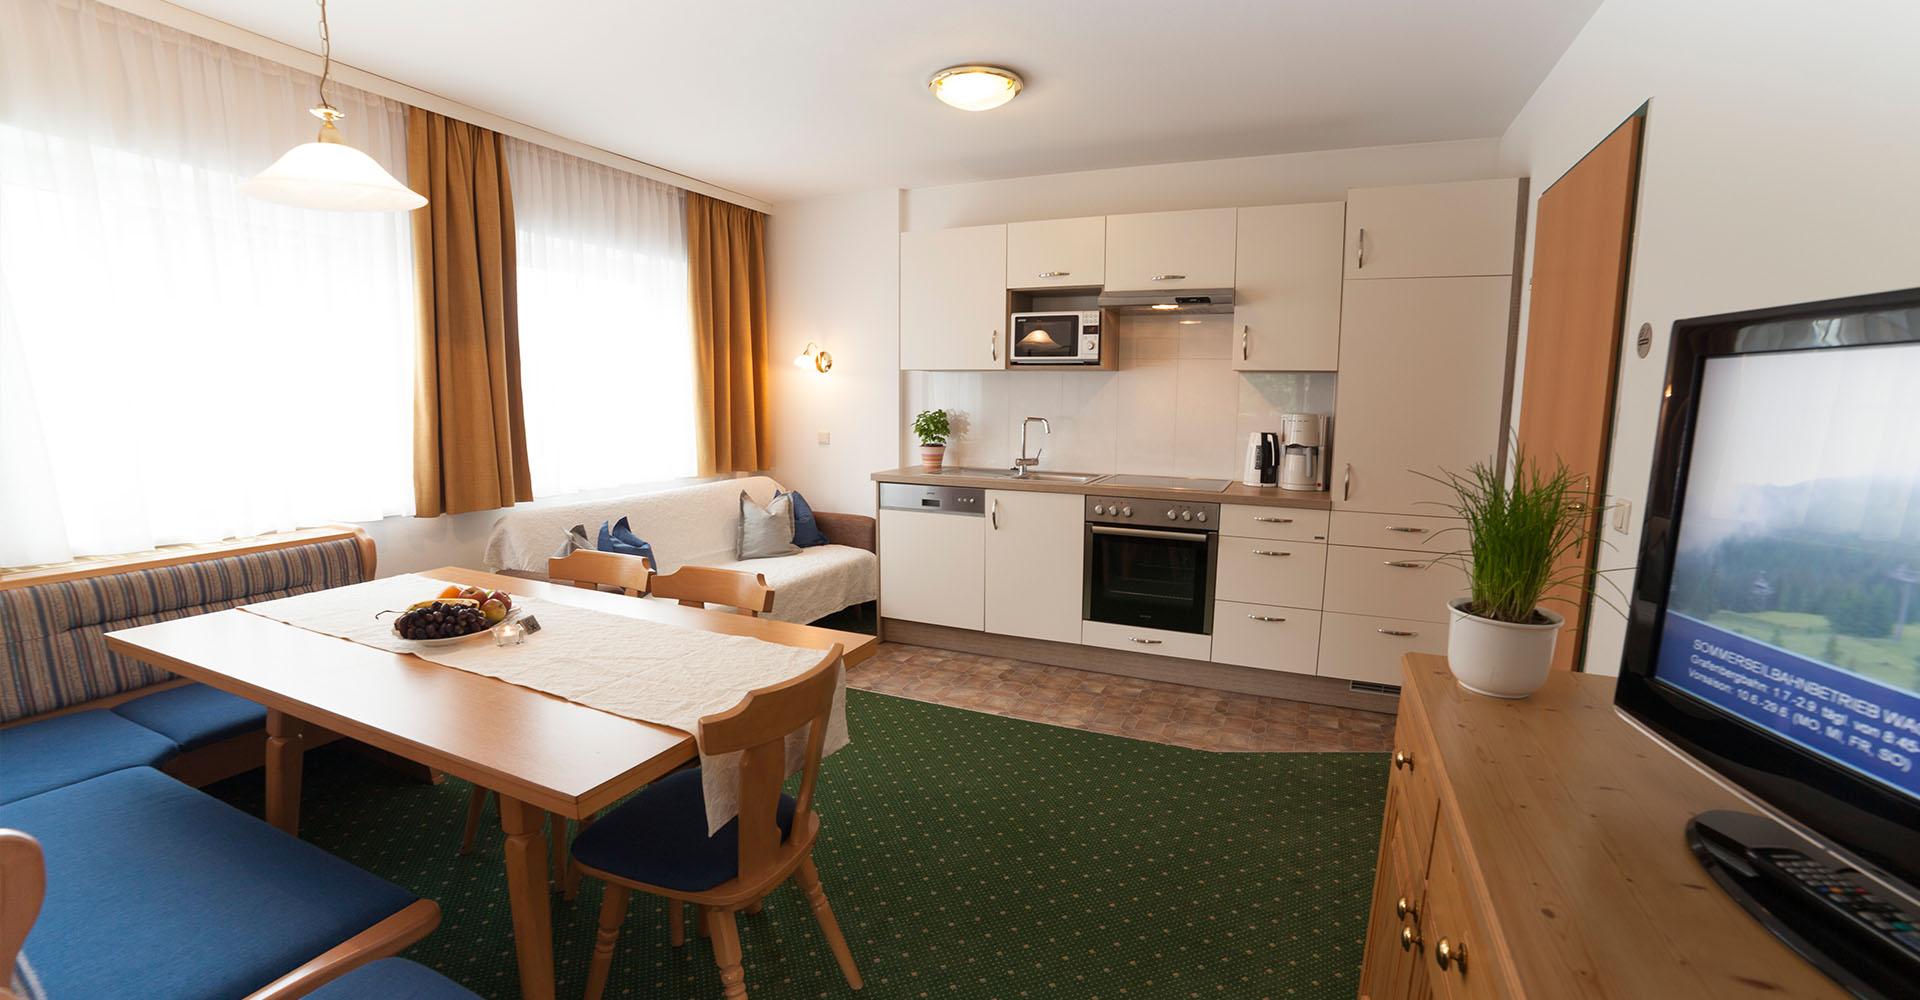 Appartement Sonnfeld in Flachau, Salzburger Land